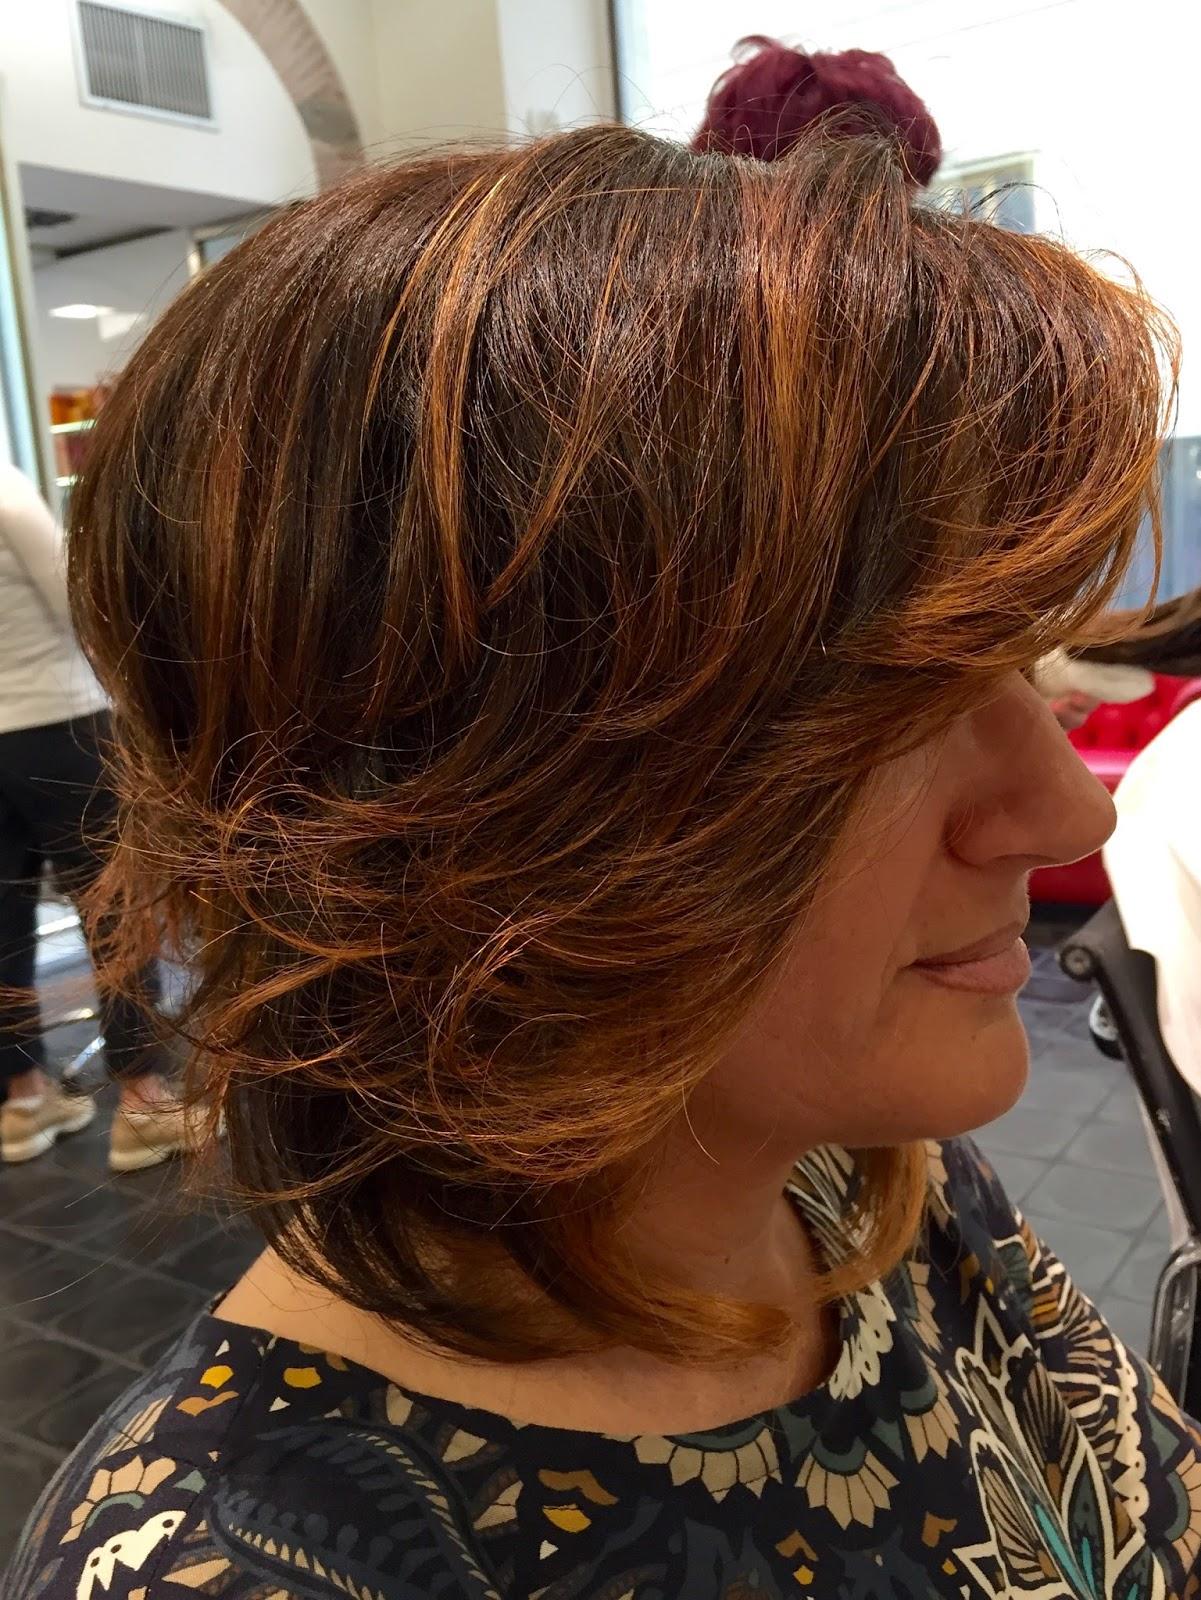 learn more at 4bpblogspotcom - Henn Color